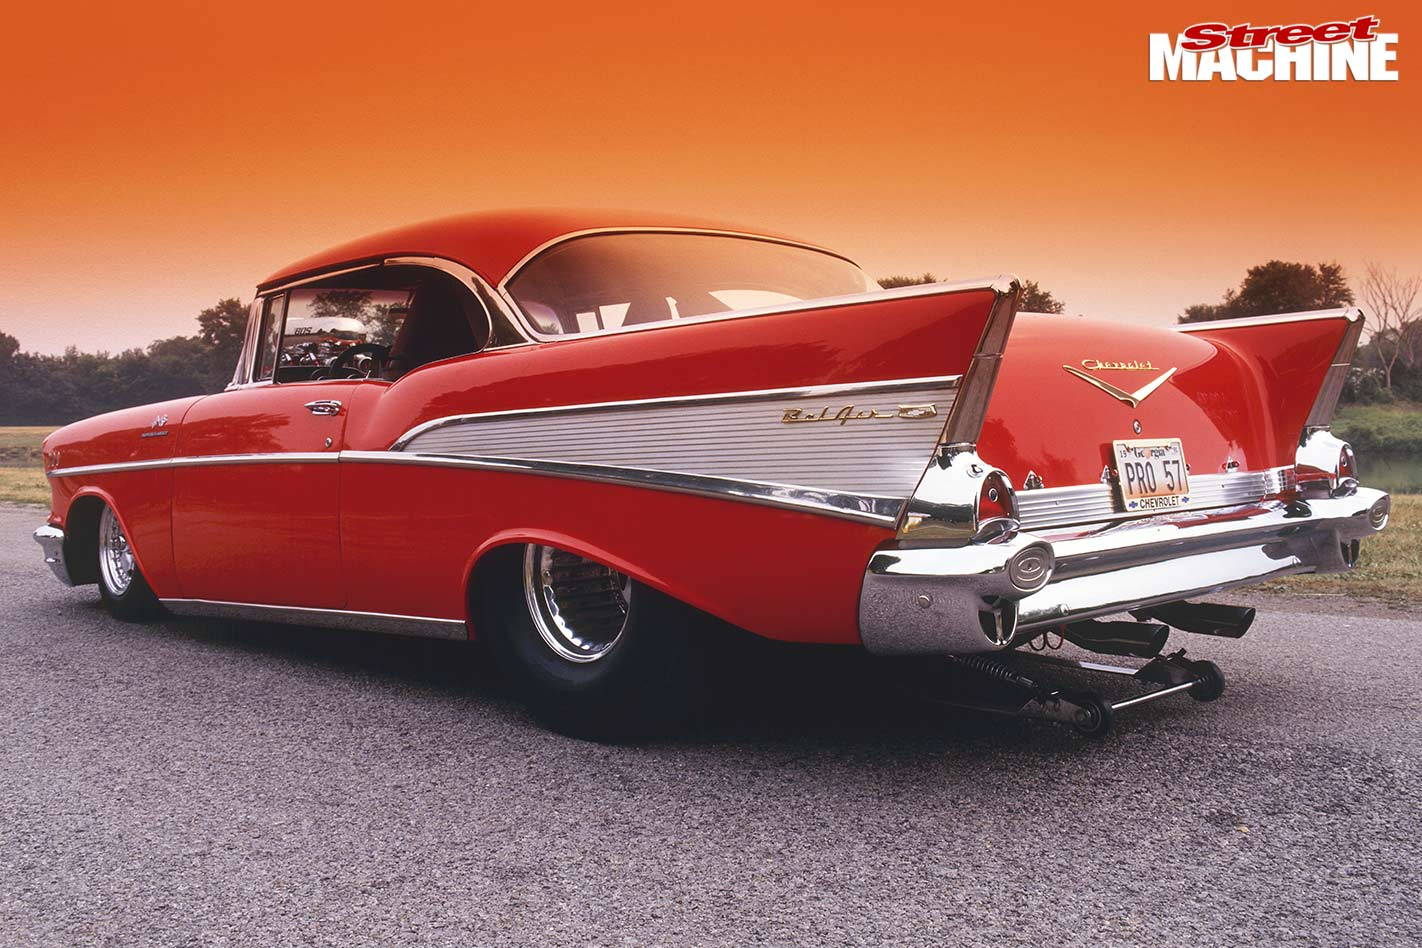 Blown Ls7 Powered 1957 Chevrolet Bel Air 57 Chevy Rear Bumper Chev